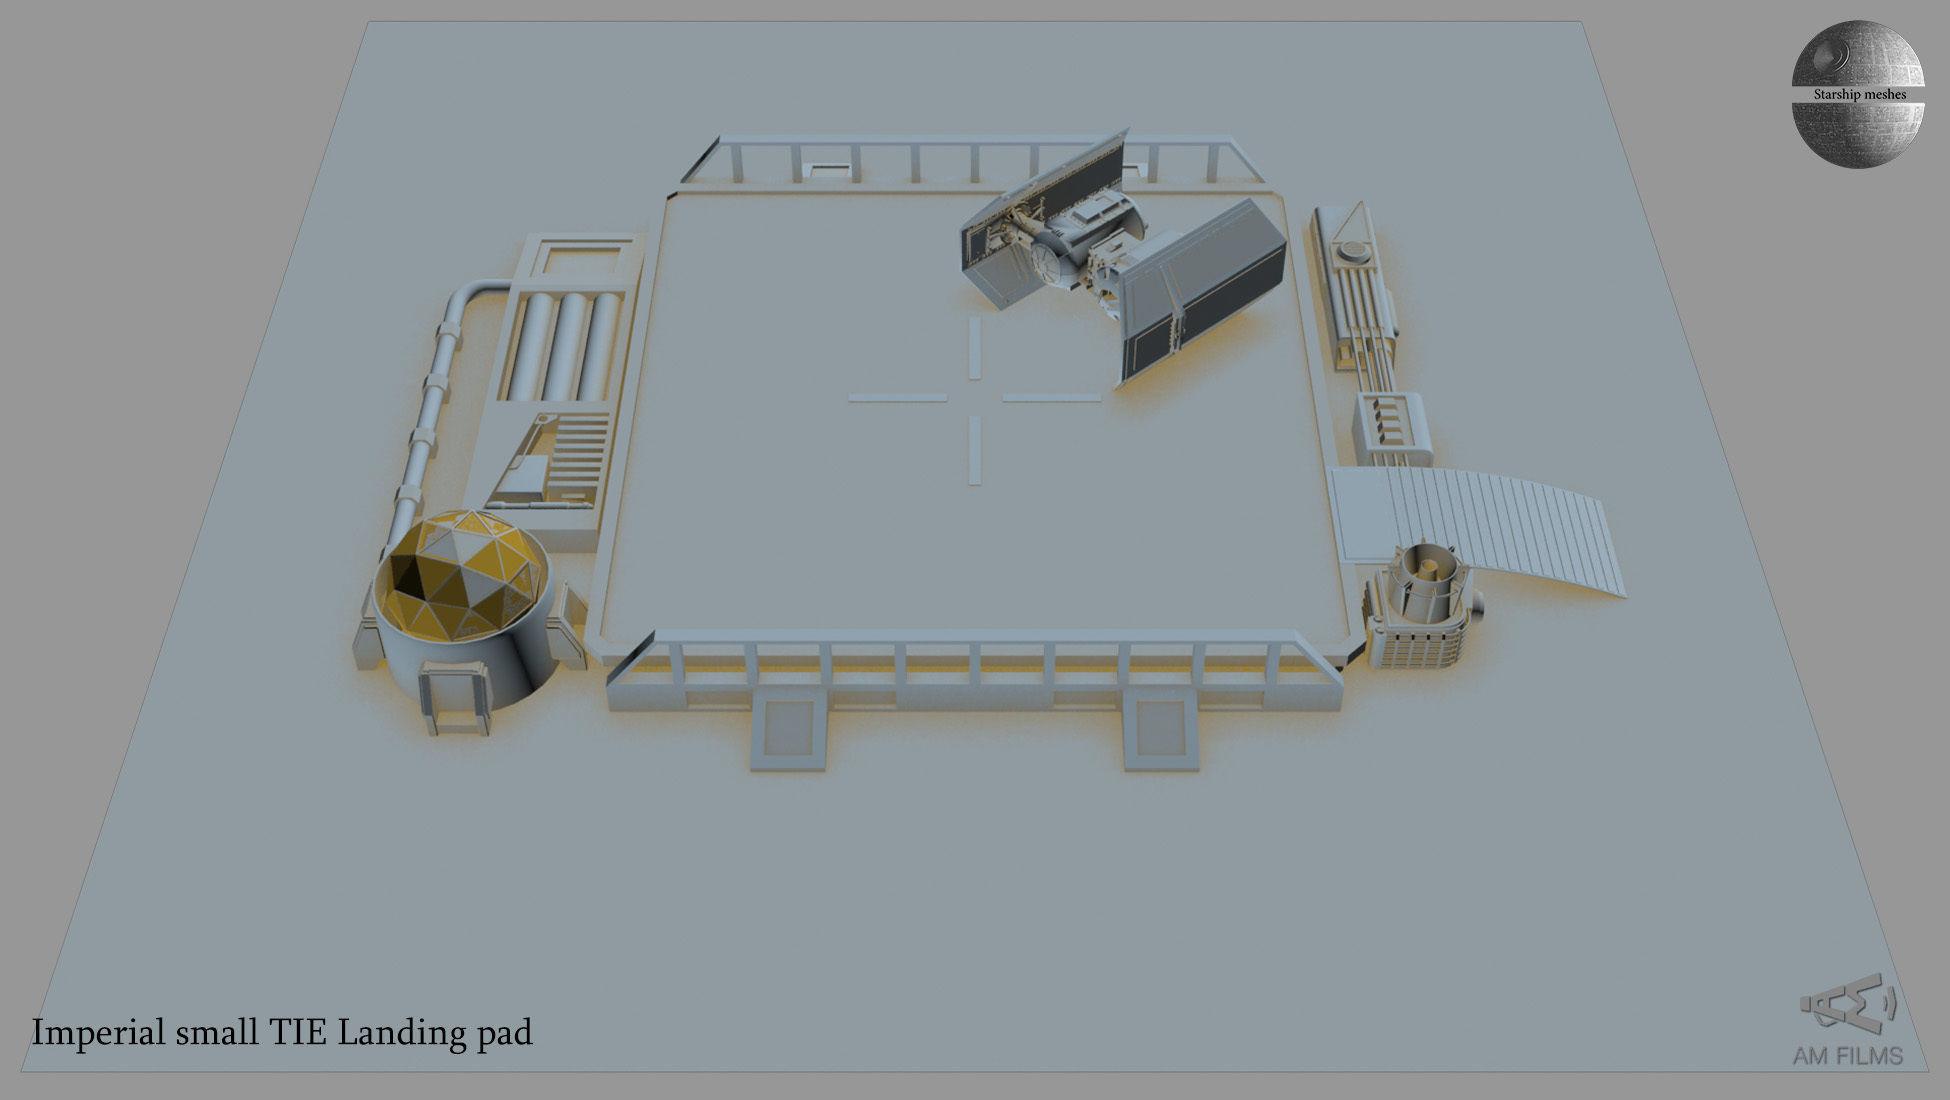 lmperial small TIE  landing pad